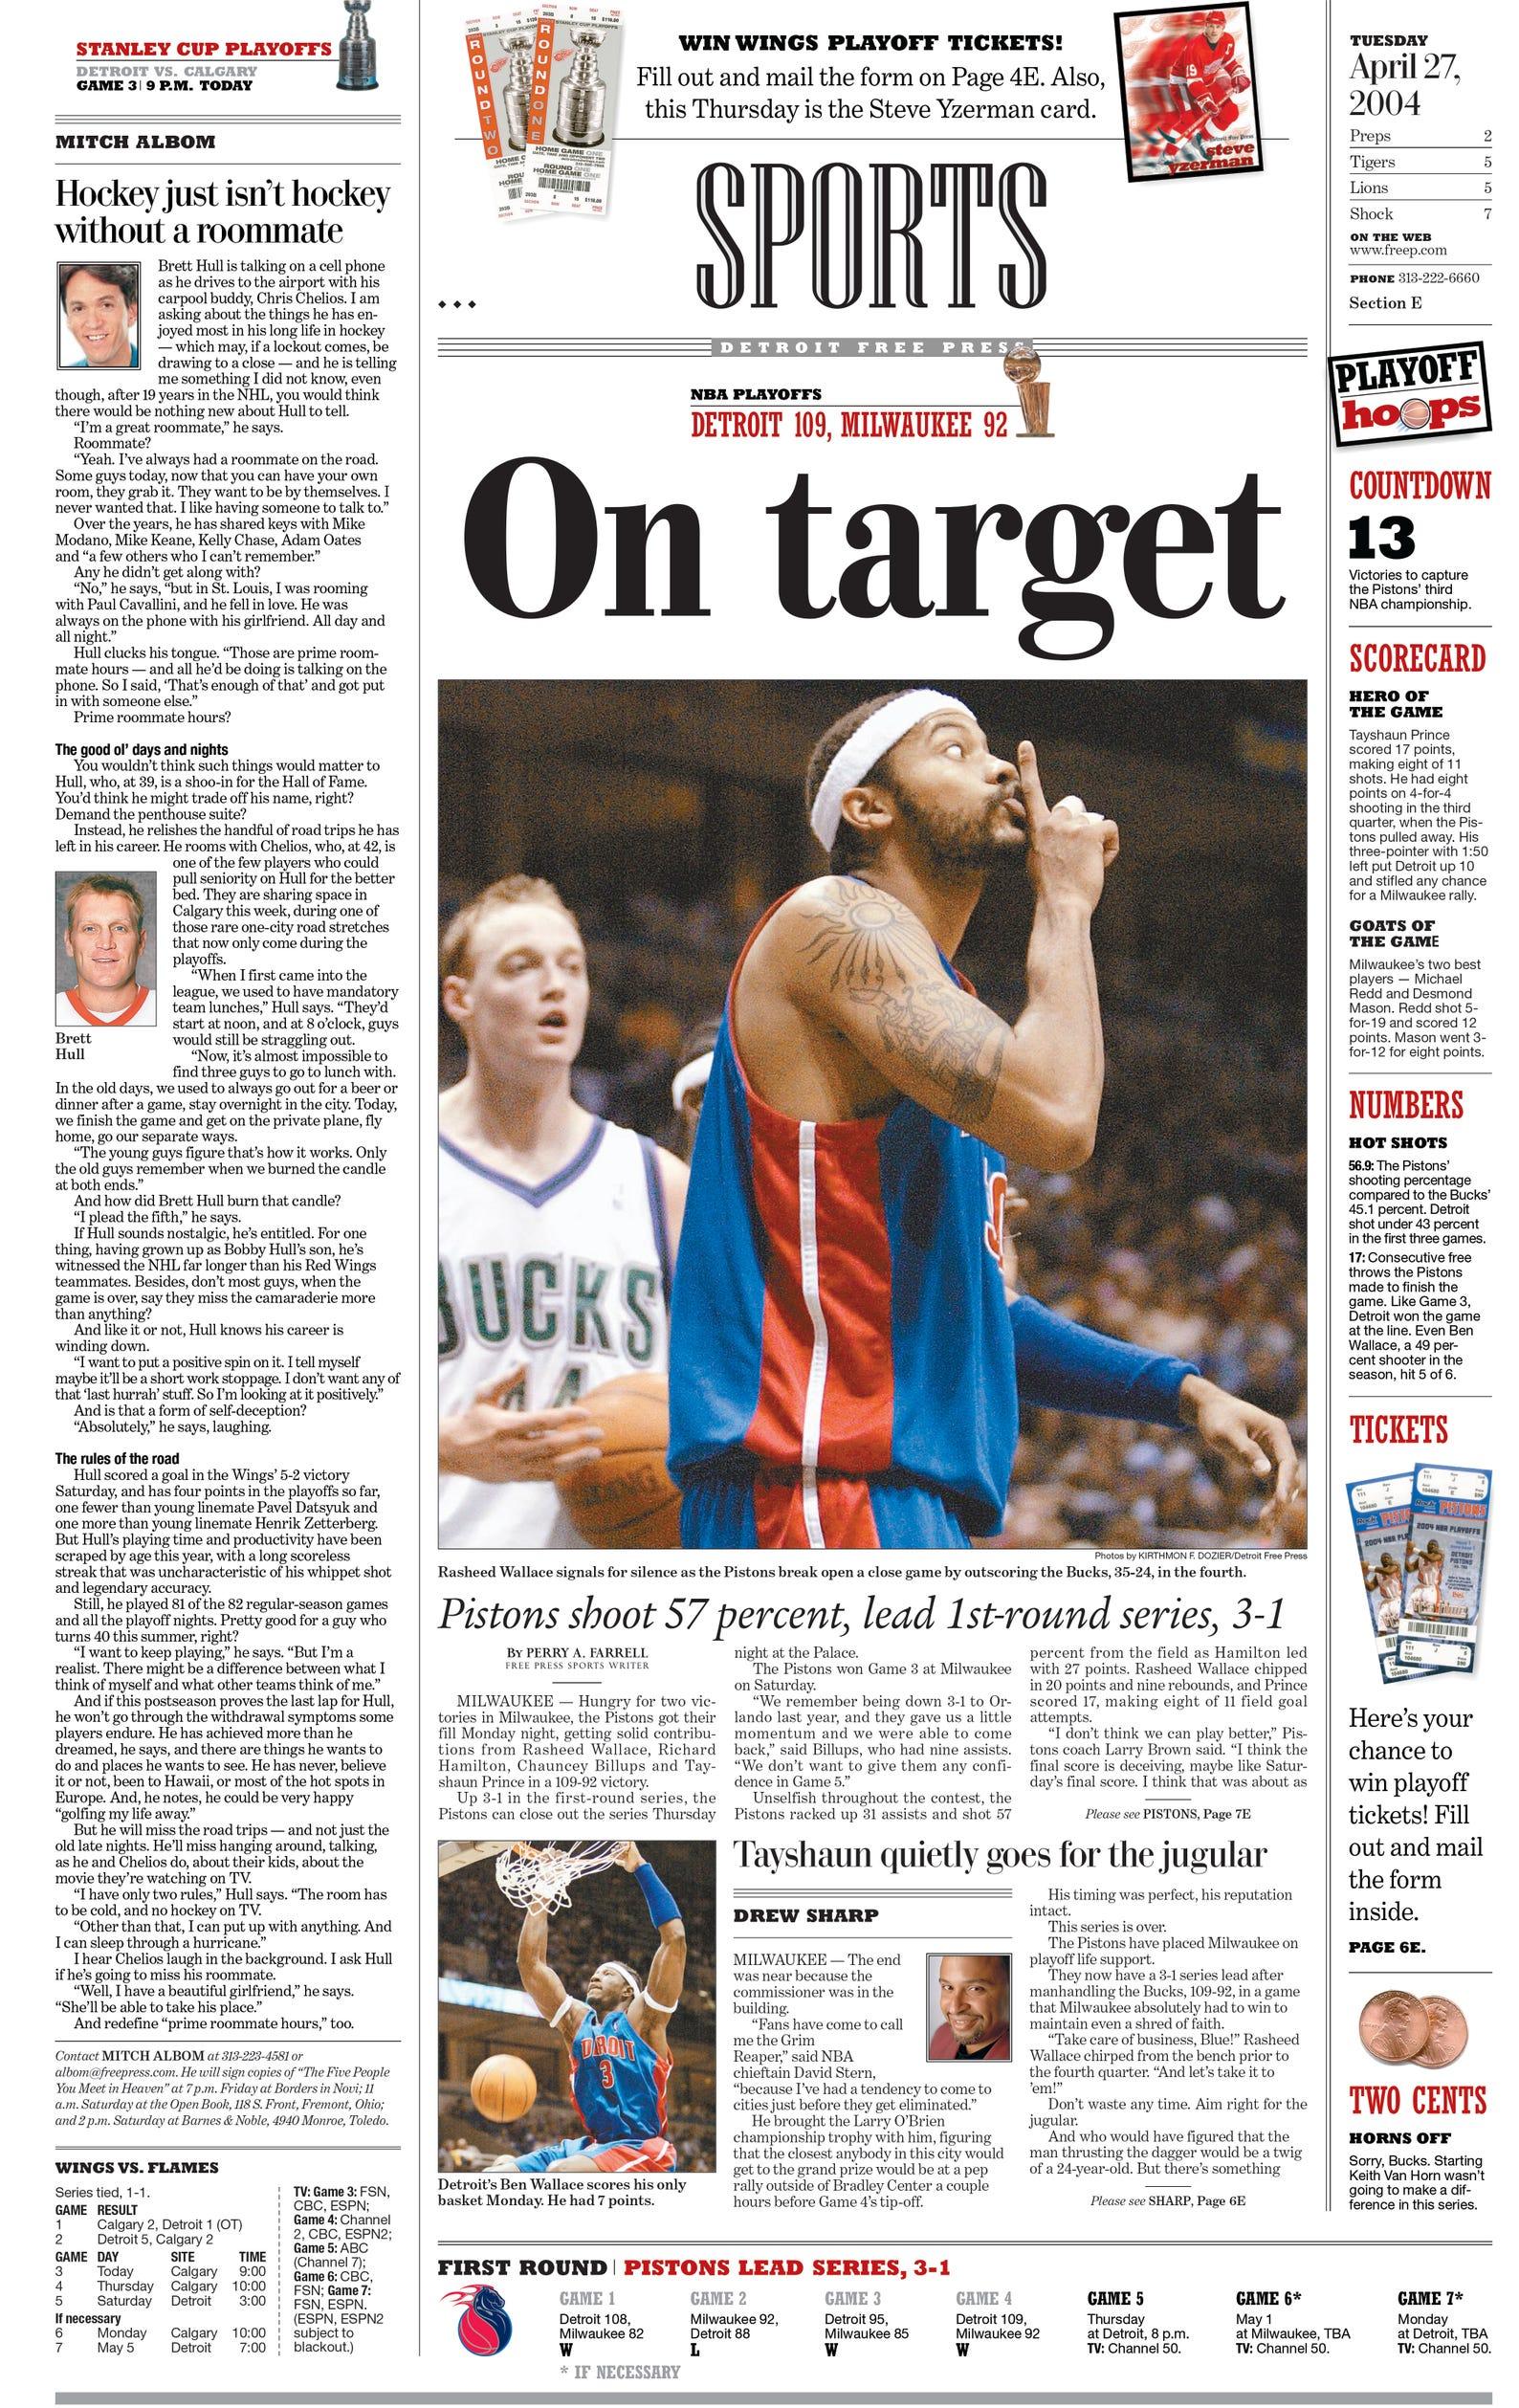 Free Press Headlines Chronicle Detroit Pistons 2004 Nba Title Run